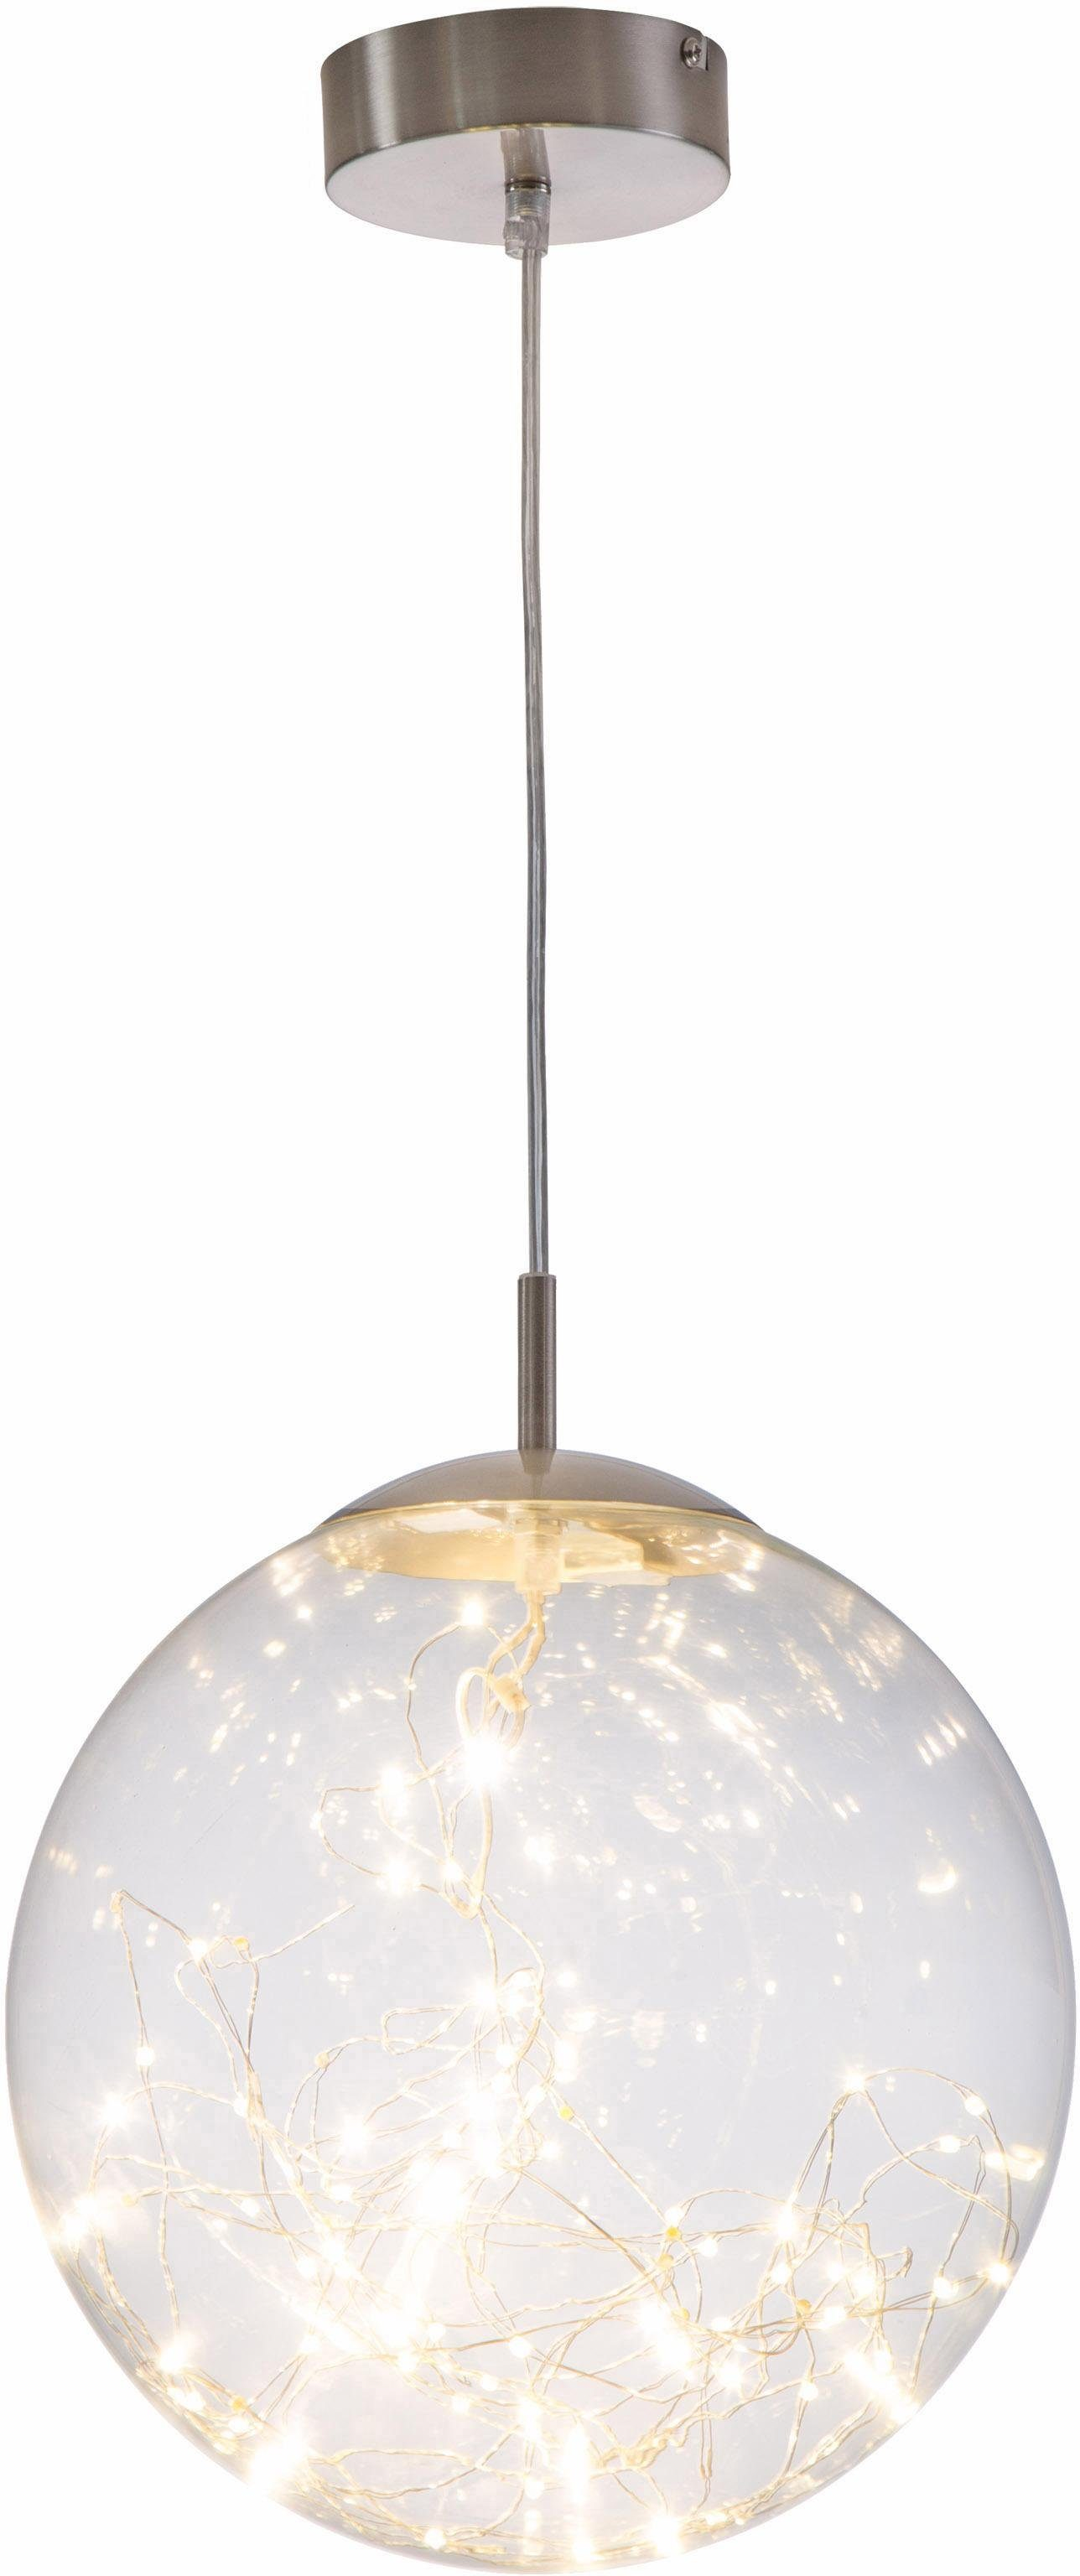 Nino Leuchten LED Pendelleuchte »LIGHTS«, 1-flammig